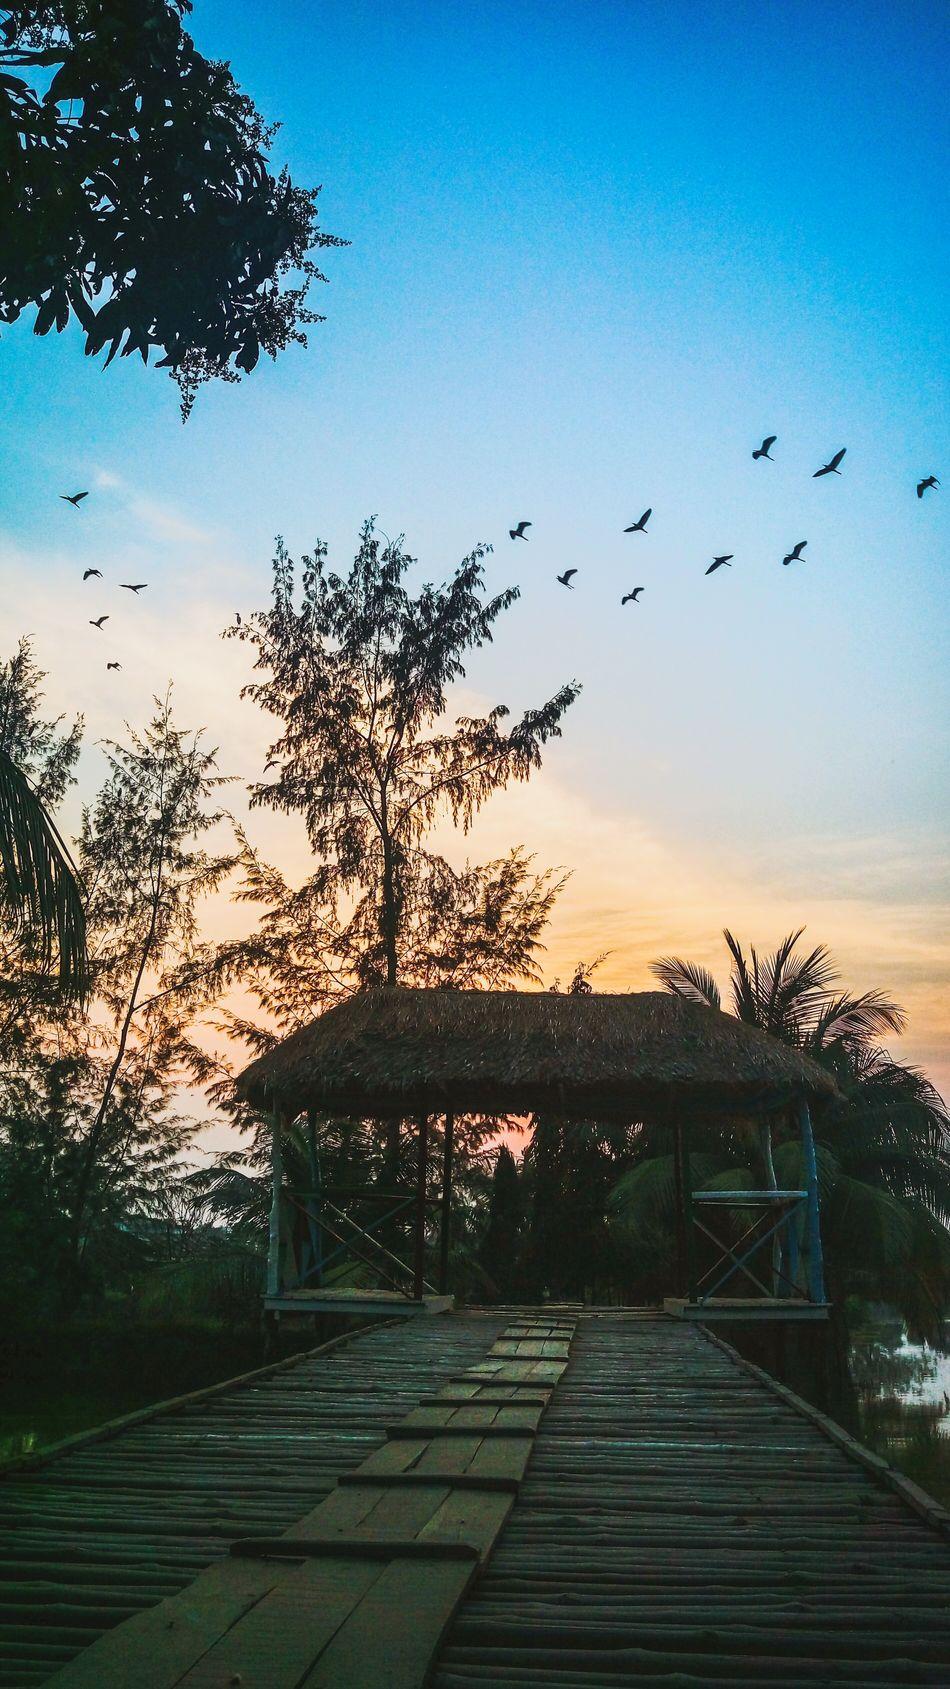 Naturelovers Mobilephotography Sundown Beautiful Nature Evening Sky Migratory Birds Spring! Natgeo Traveling Relaxing EyeEm Gallery